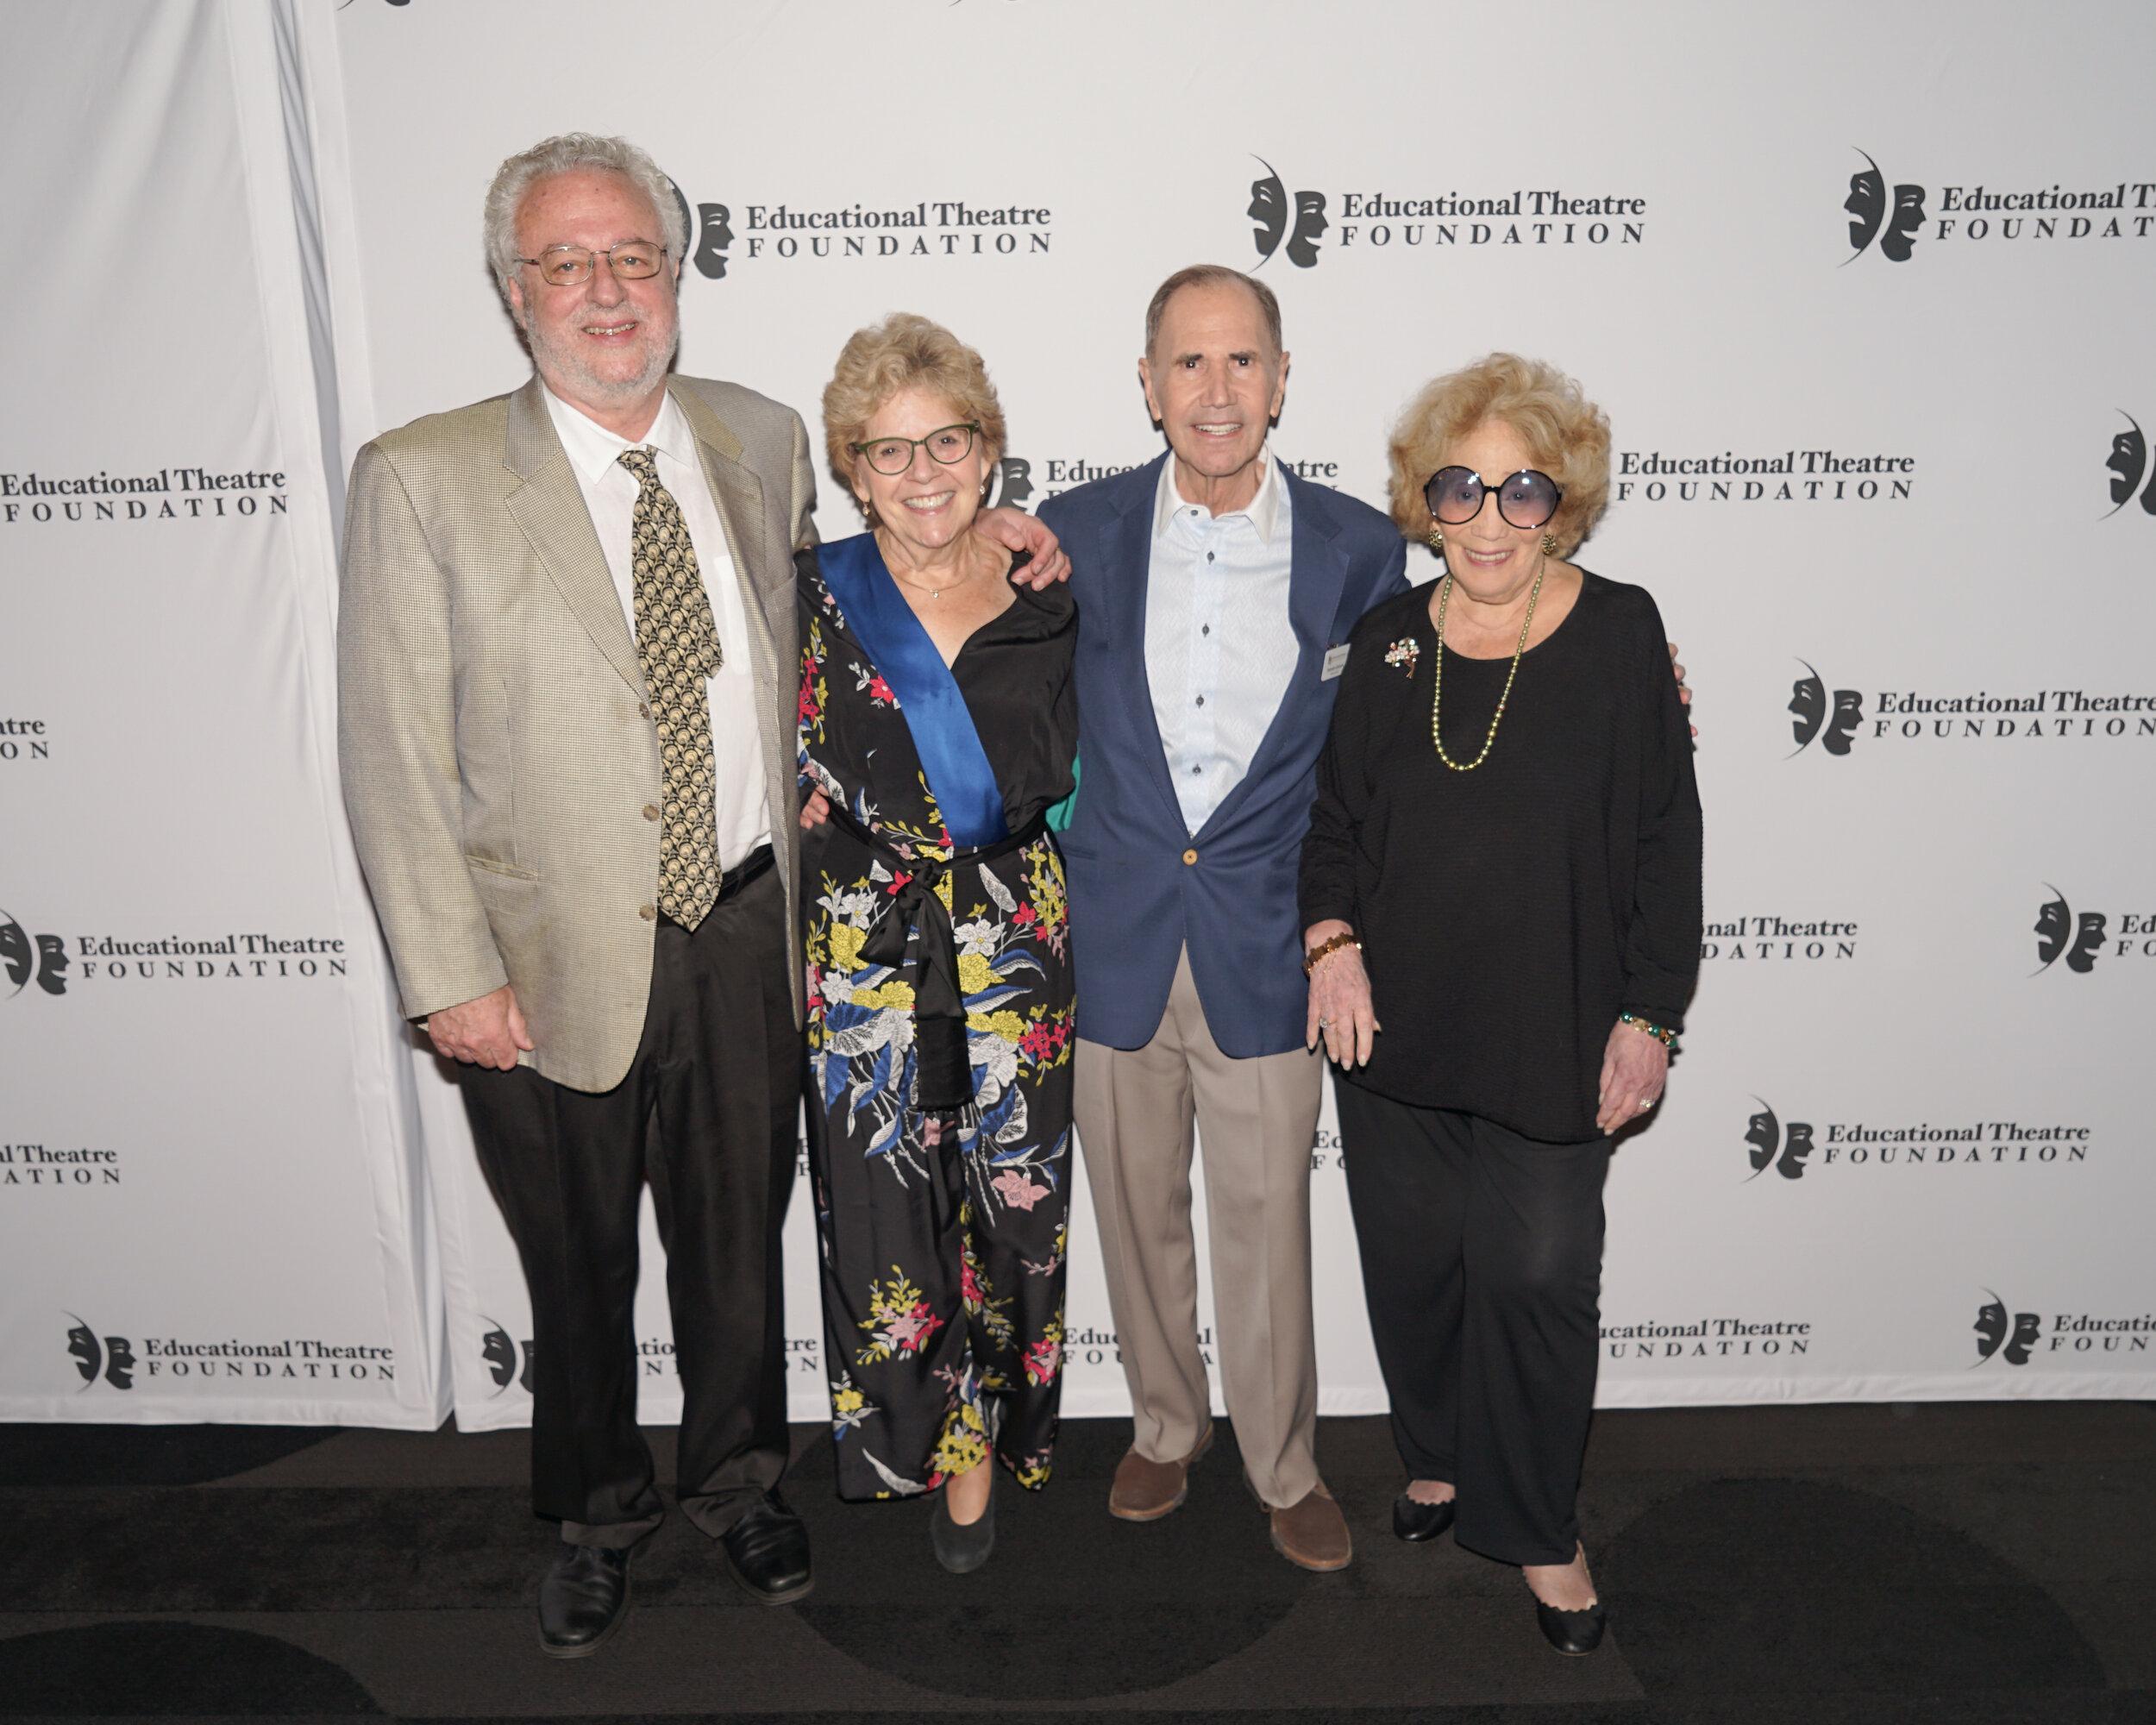 DSC_04766 Harvey Zirofsky, Sharon Dunn, Freddie Gershon, Myrna Gershon.jpg